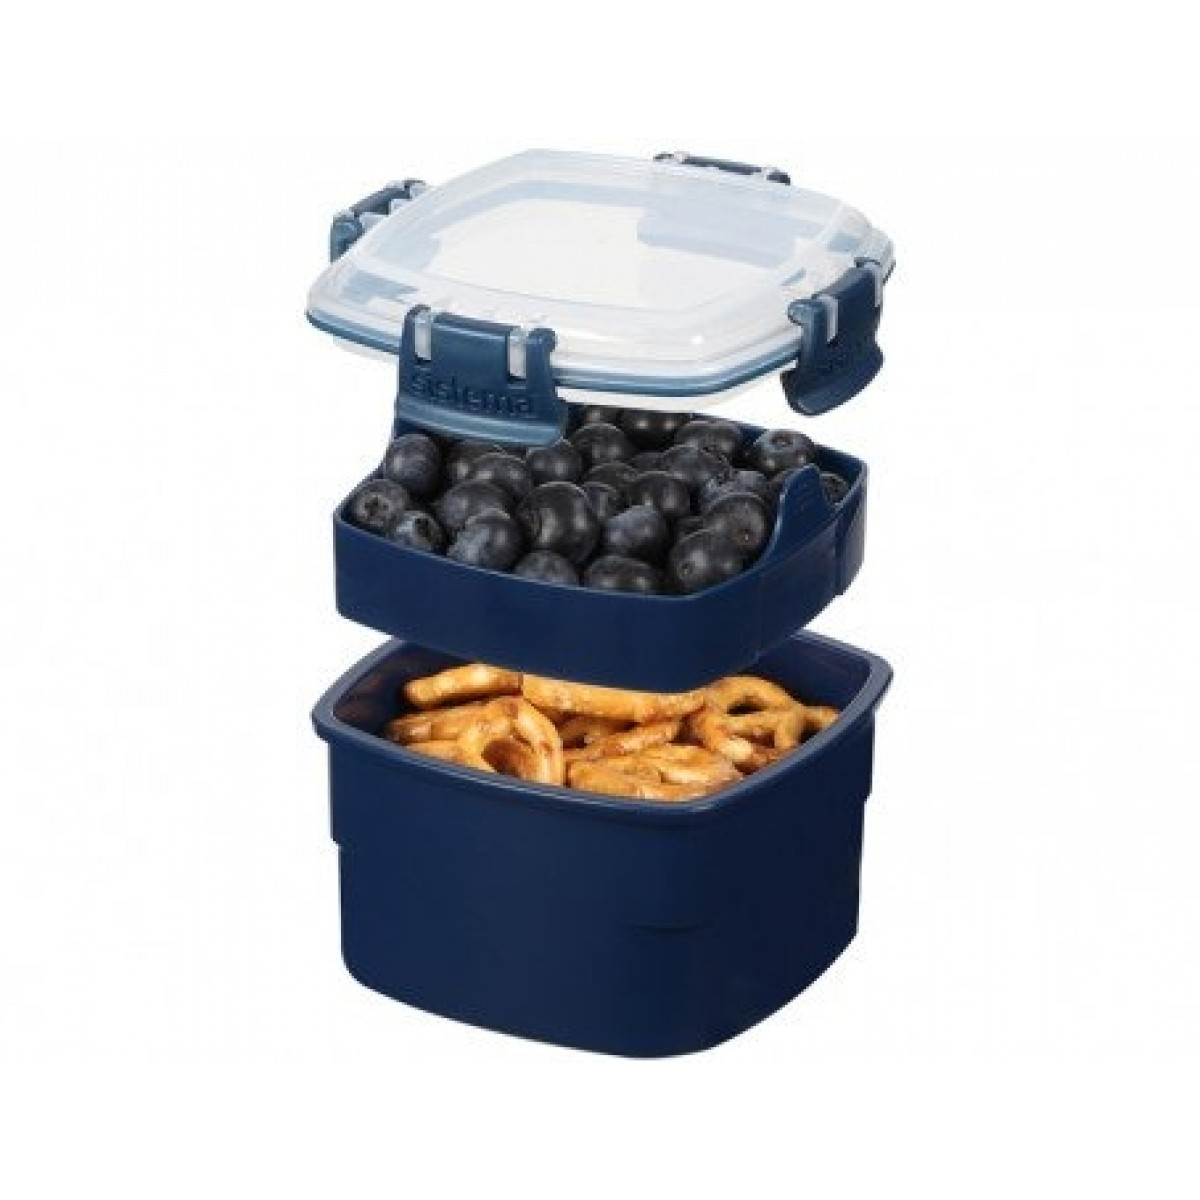 SISTEMA Snack boks m/indsats renew - blå